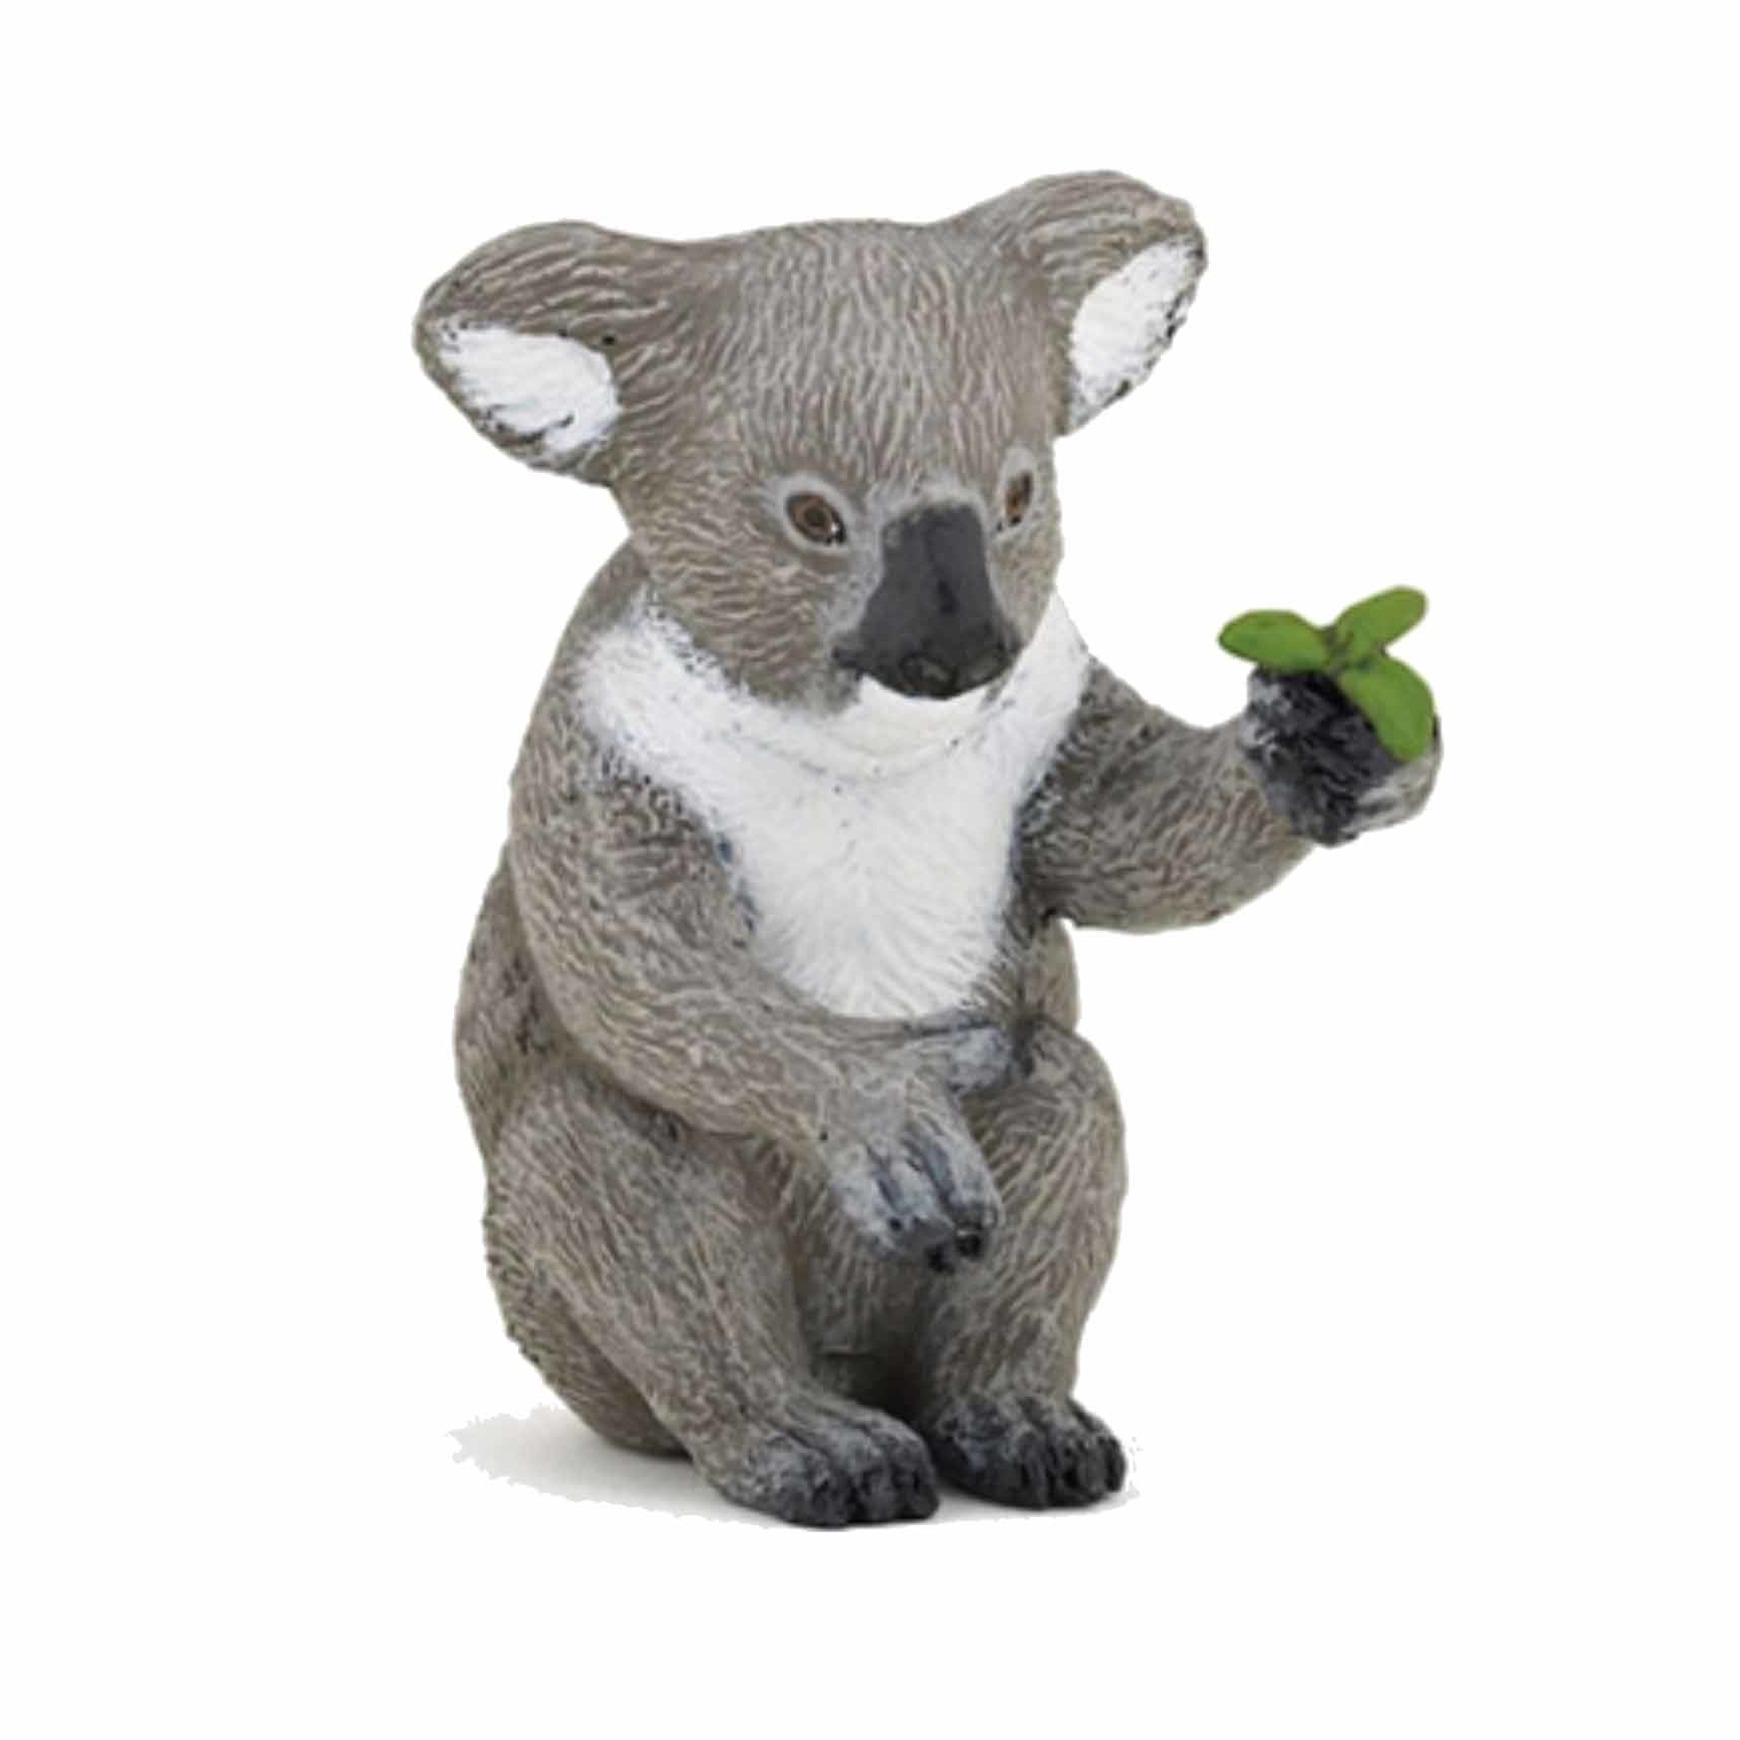 14311e56181e46 Plastic Papo dier koala sloffen/ pantoffel winkel